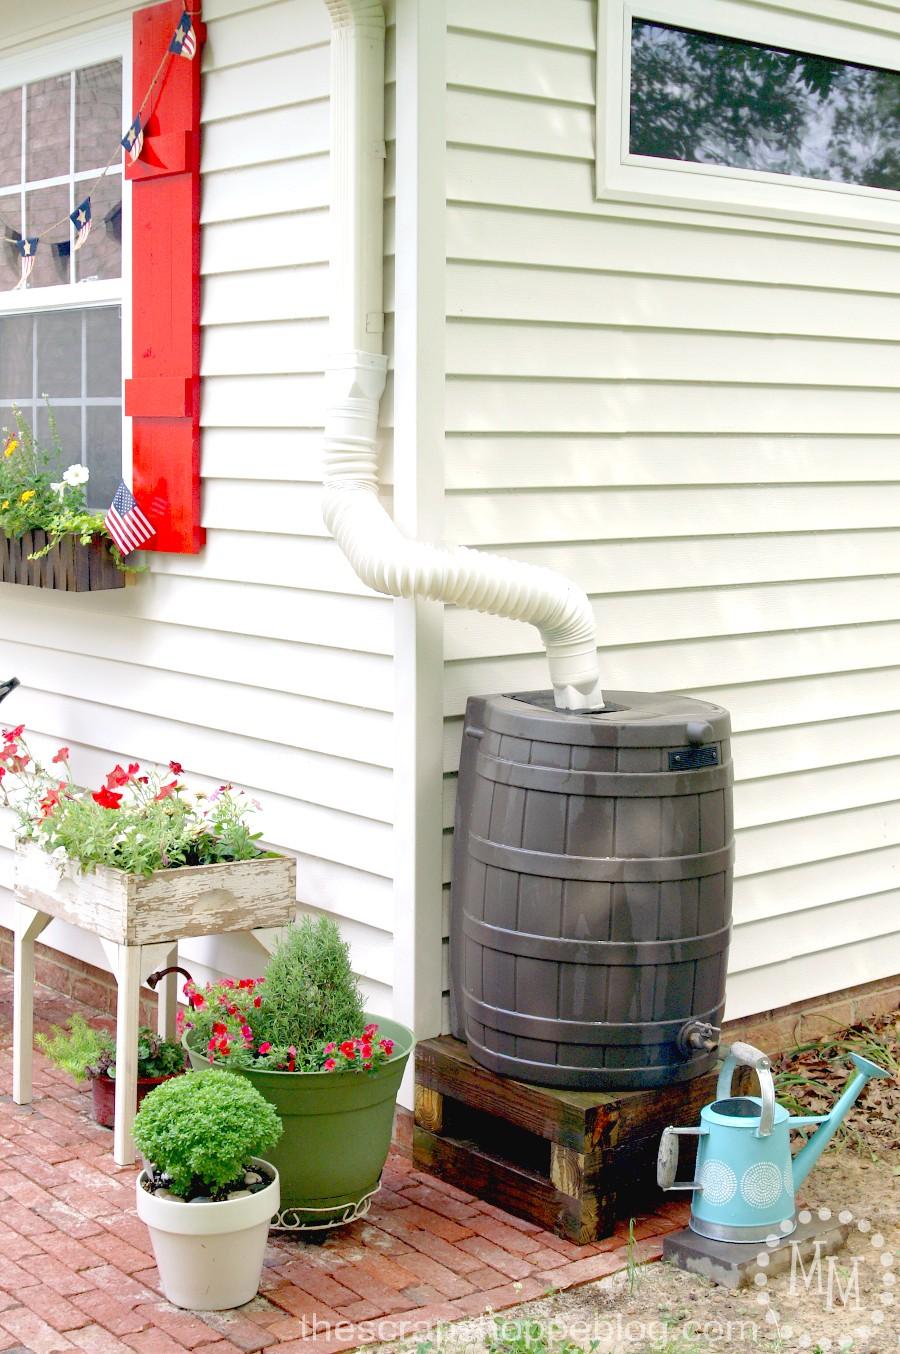 How to install a rain barrel the scrap shoppe for Diy small rain barrel